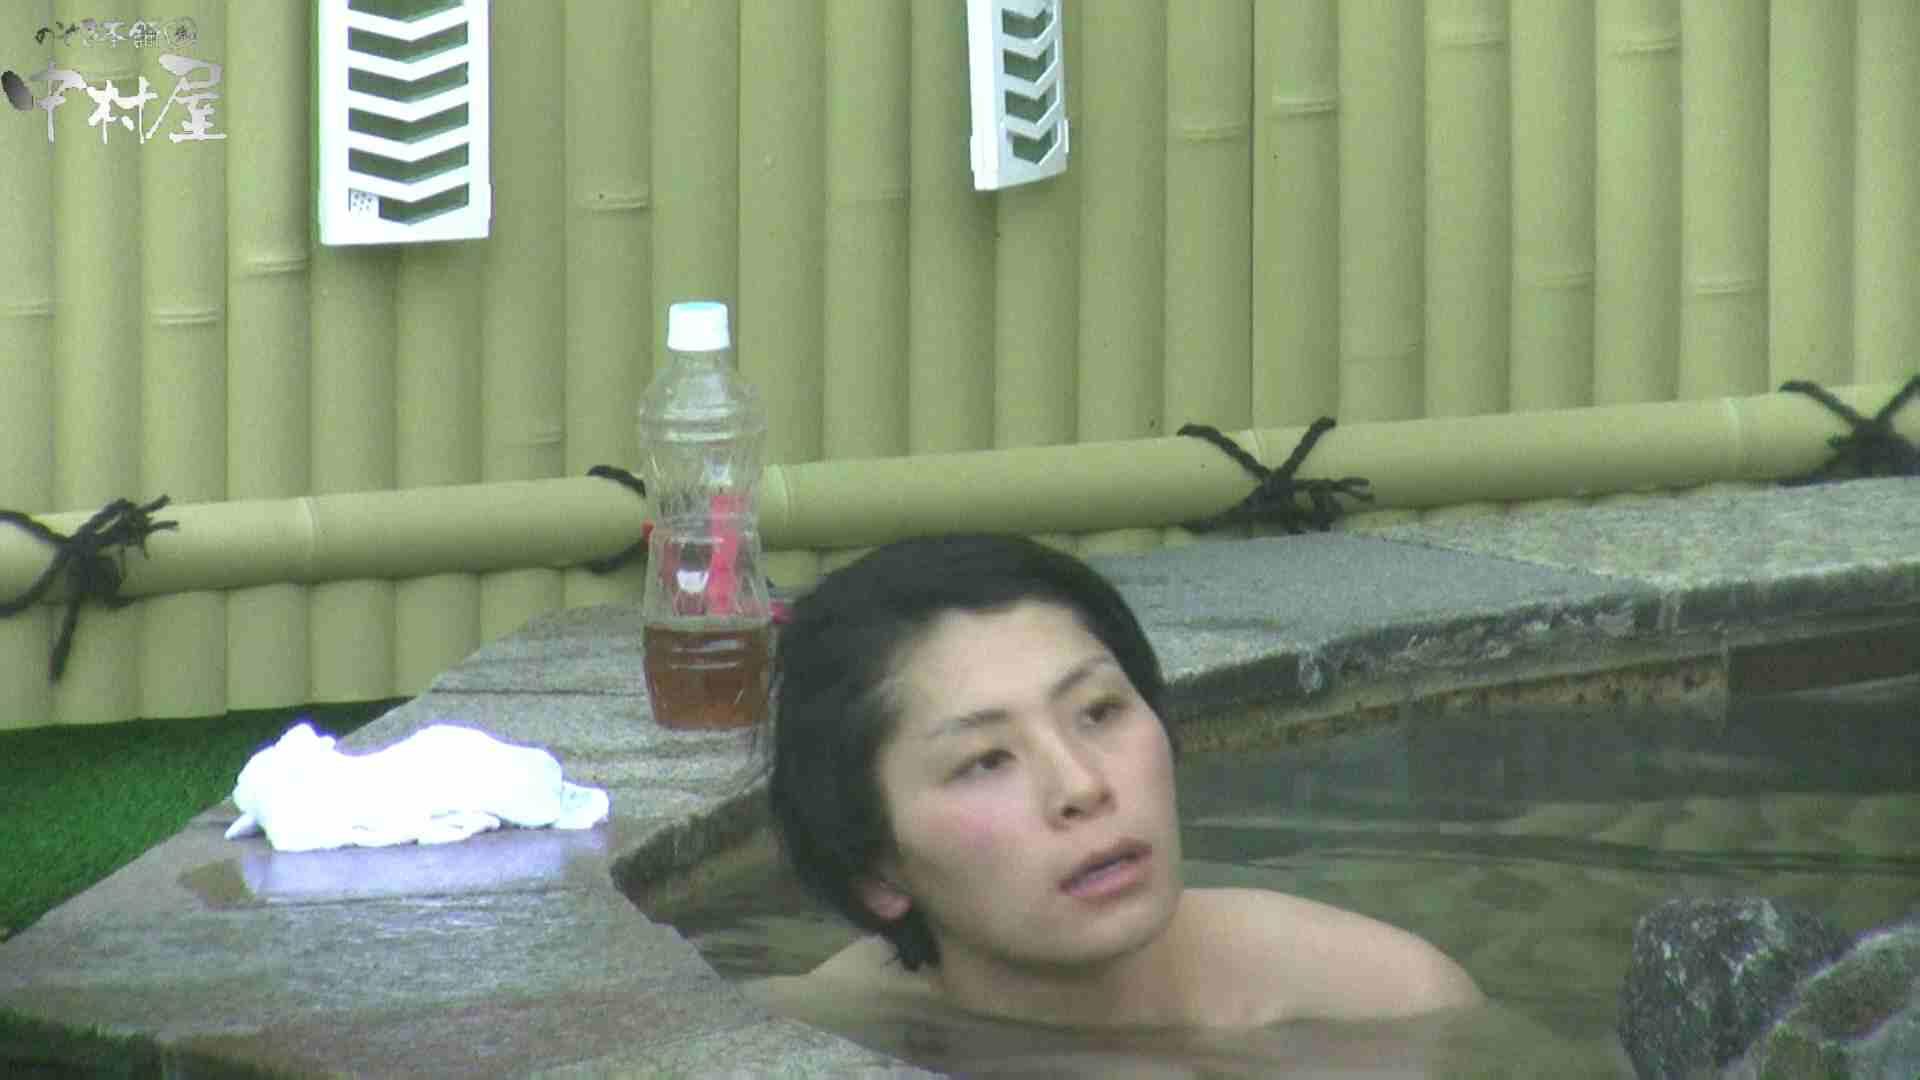 Aquaな露天風呂Vol.970 OL  59連発 16